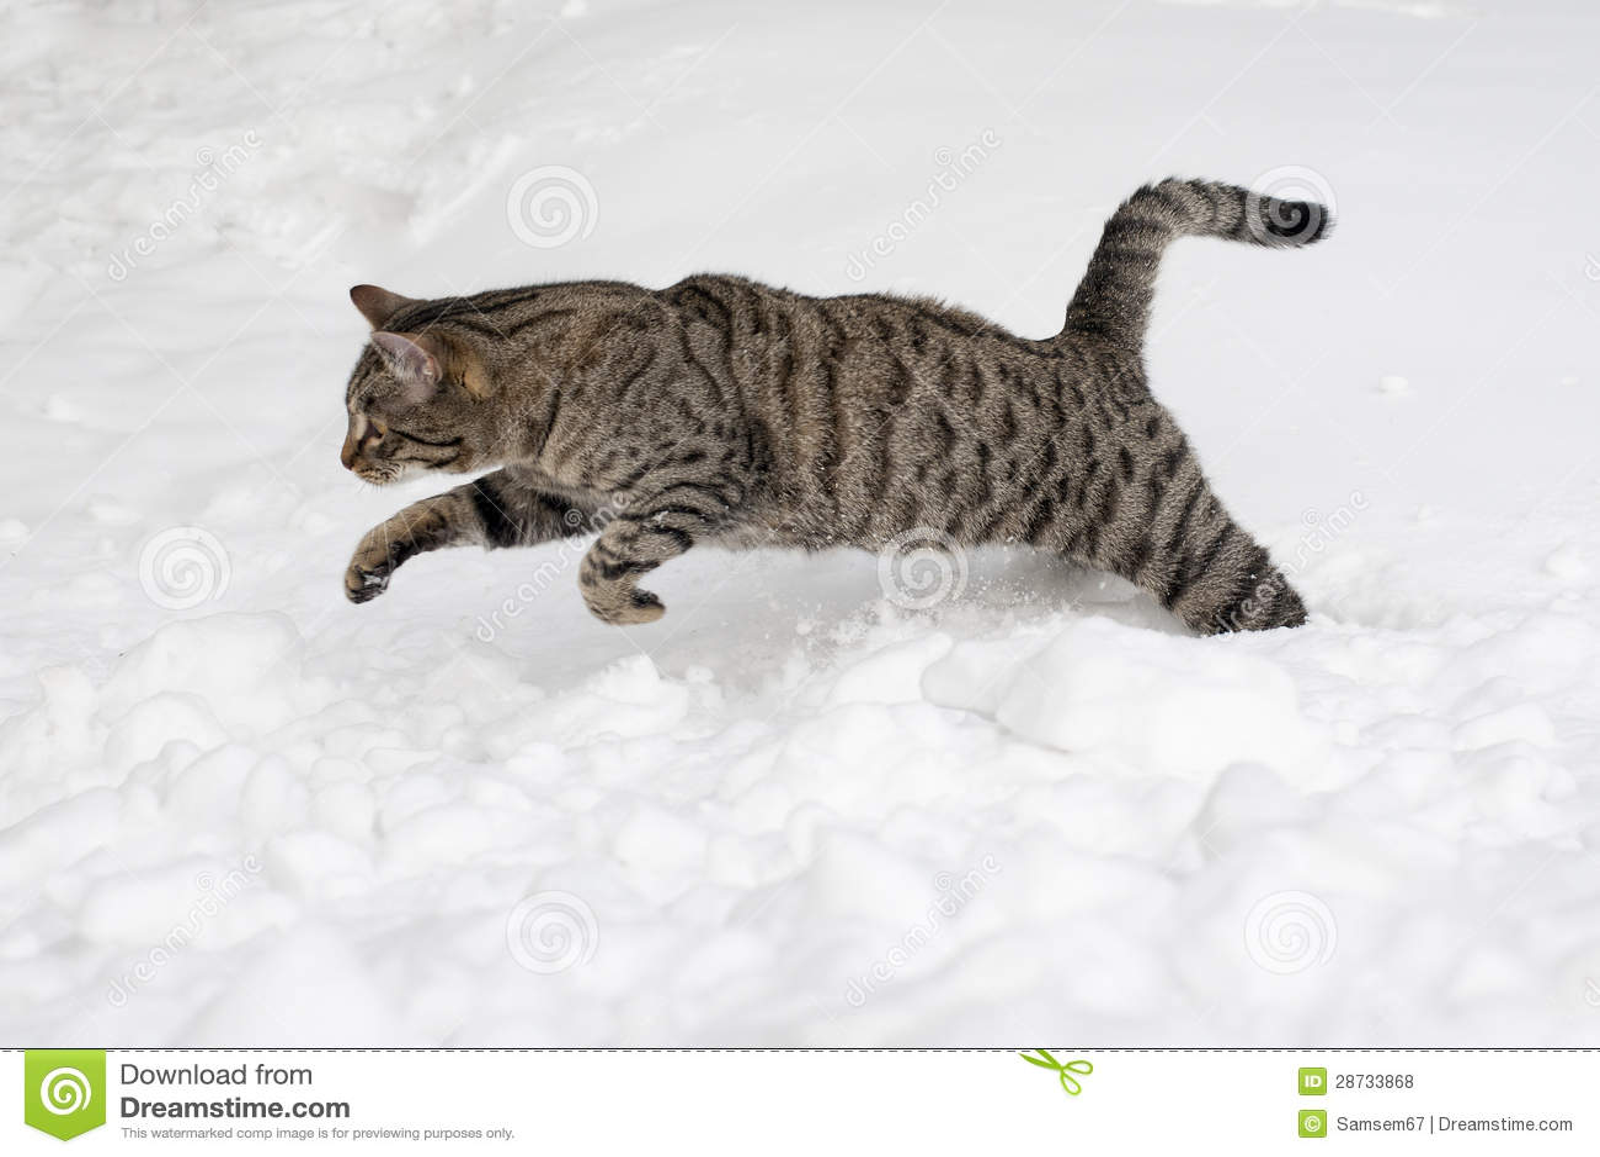 O gato cinzento está saltando na neve